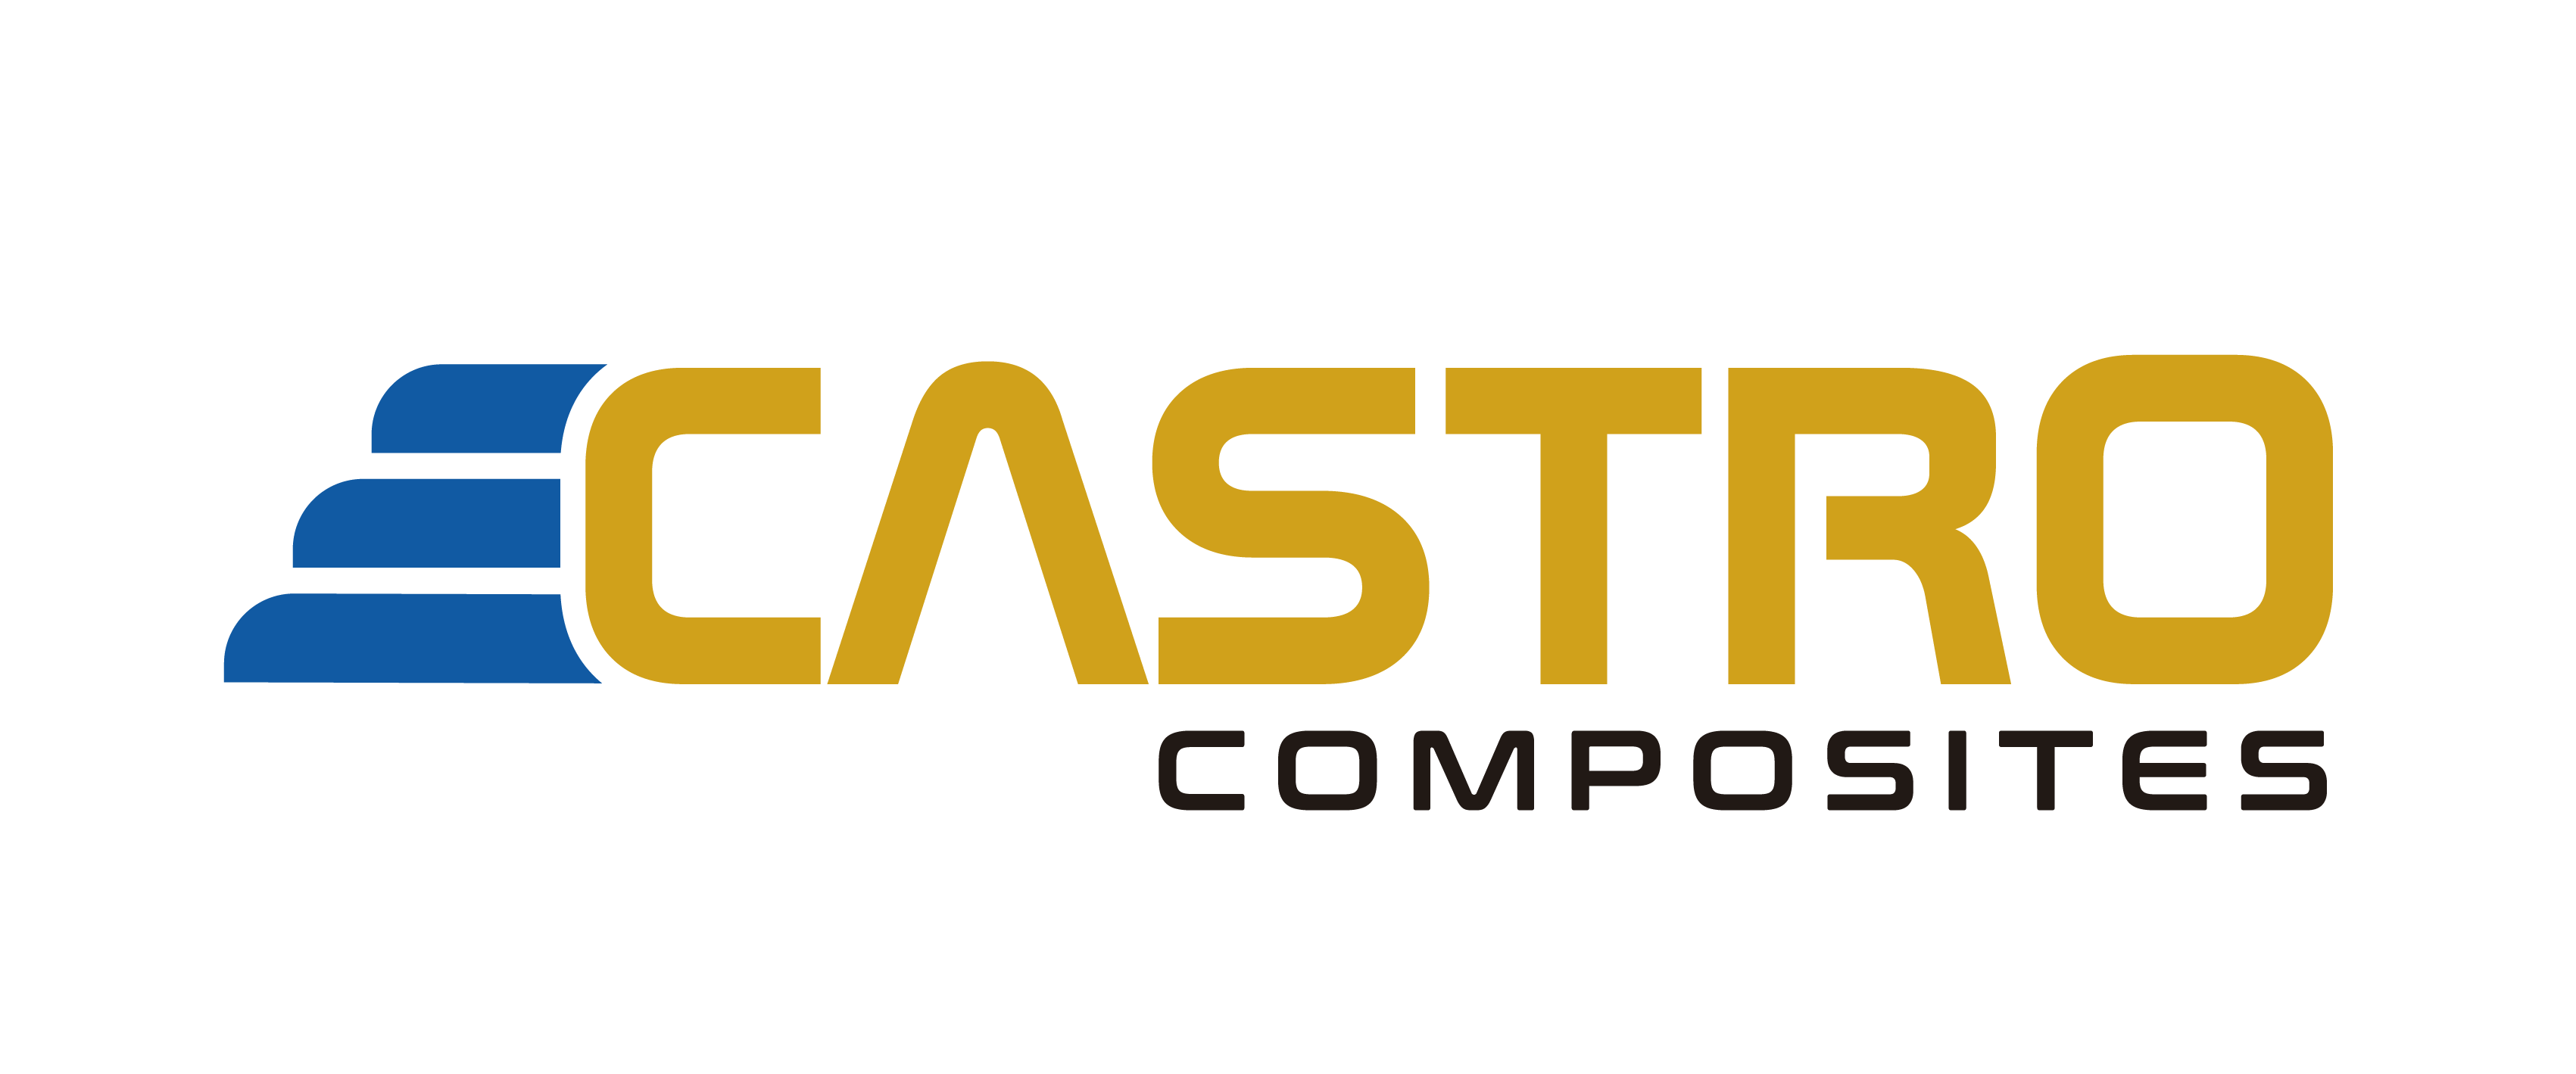 Castro Composites logo